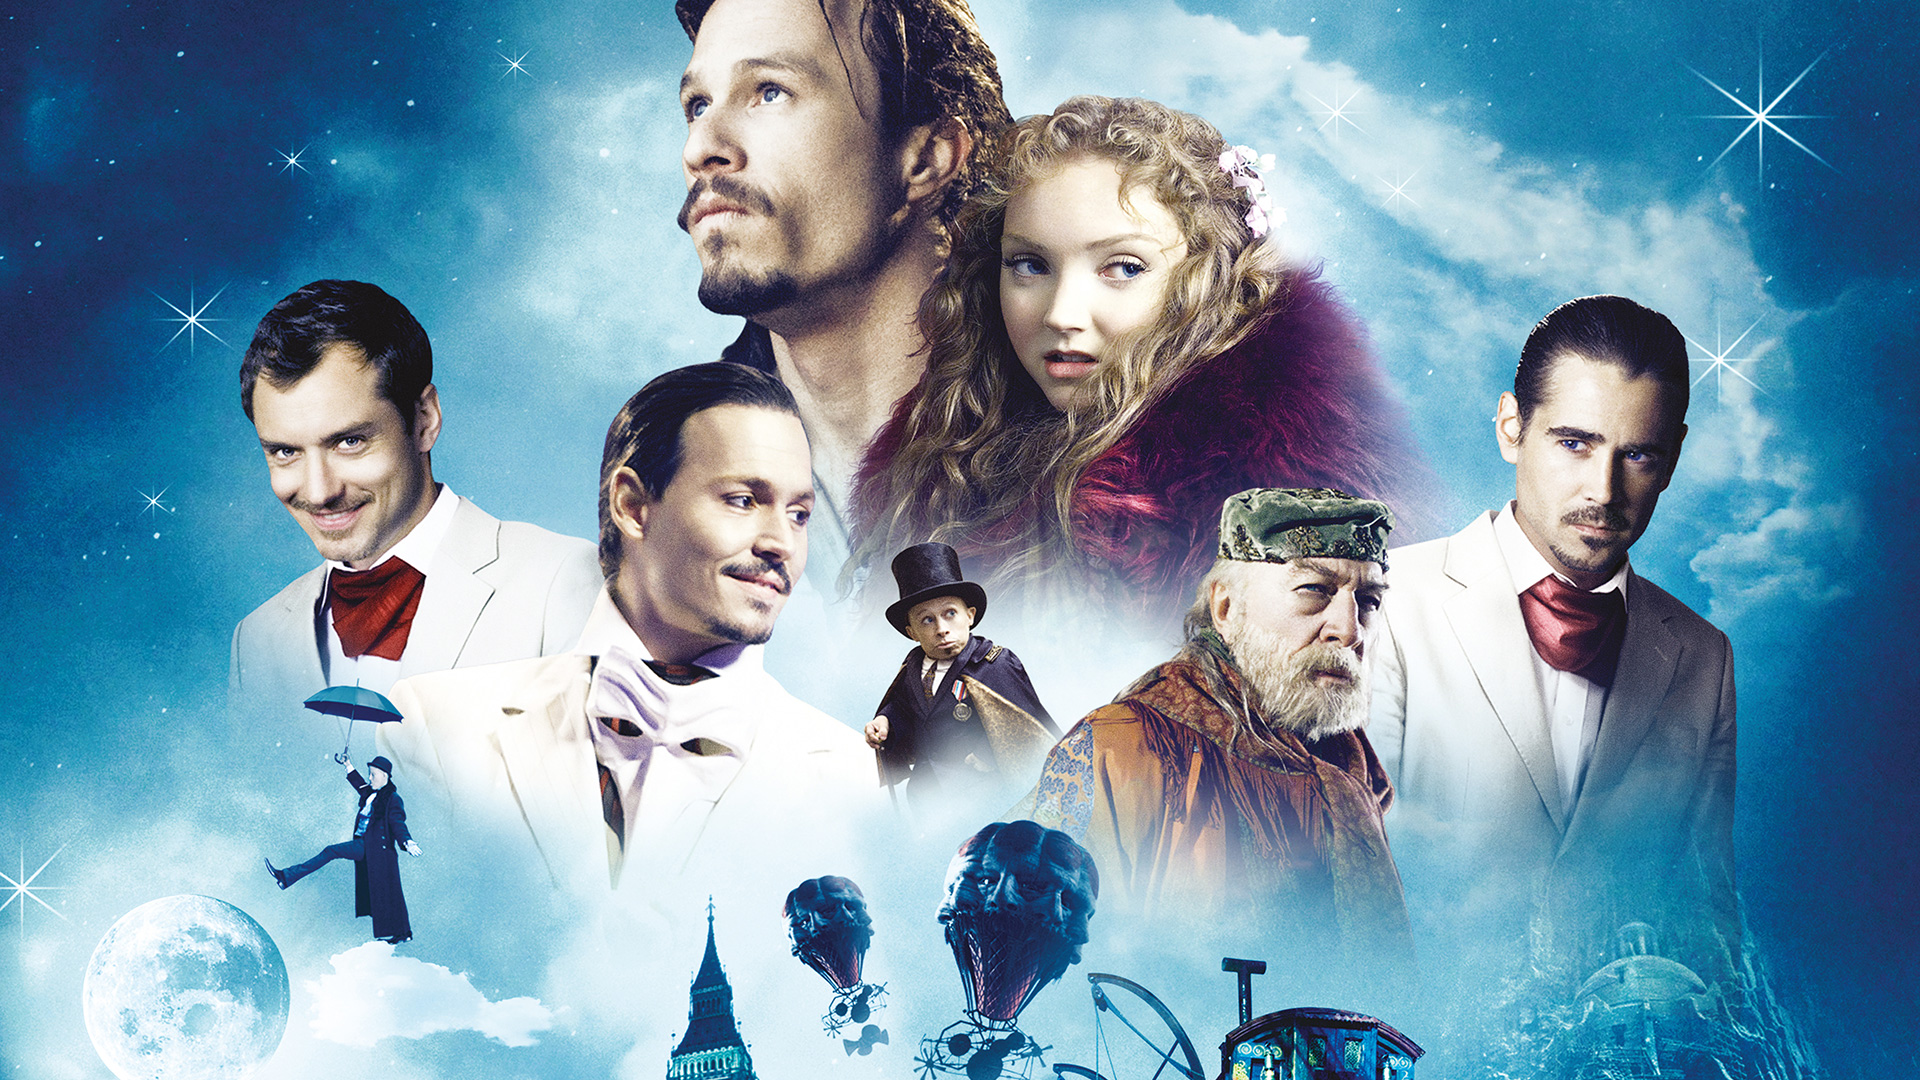 The Imaginarium of Doctor Parnassus HD Wallpaper ...